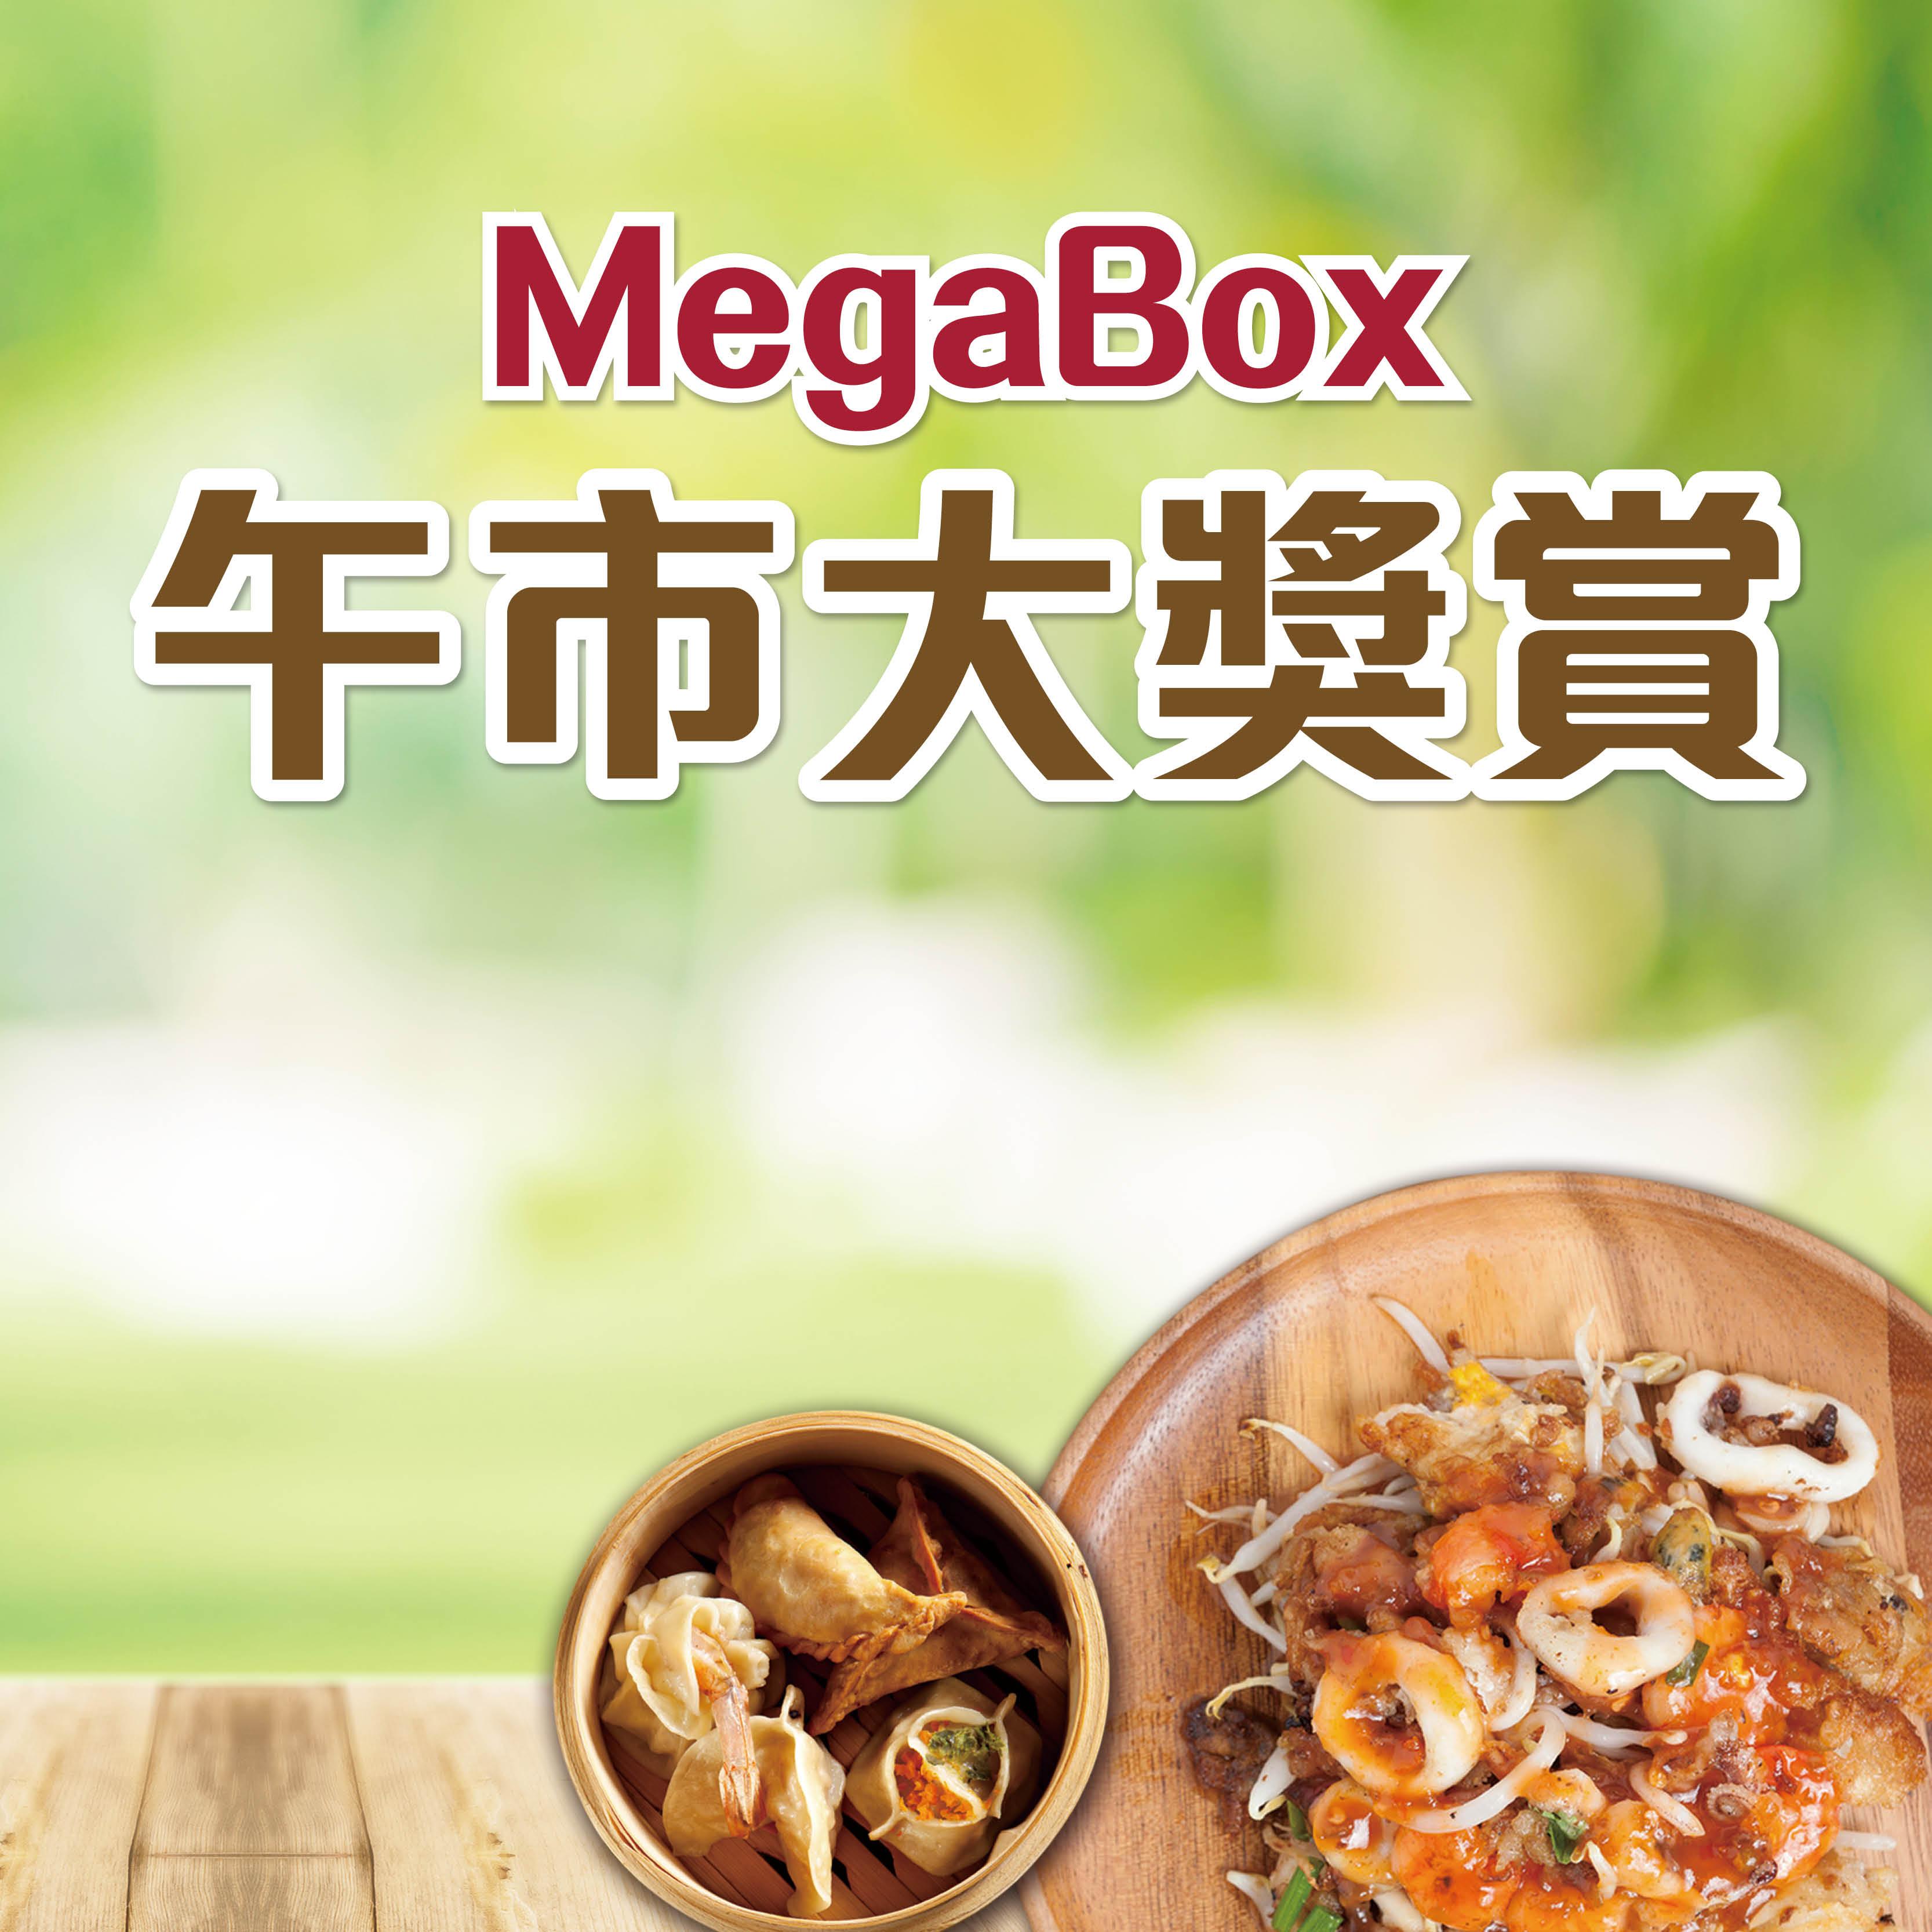 MegaBox 午市大獎賞